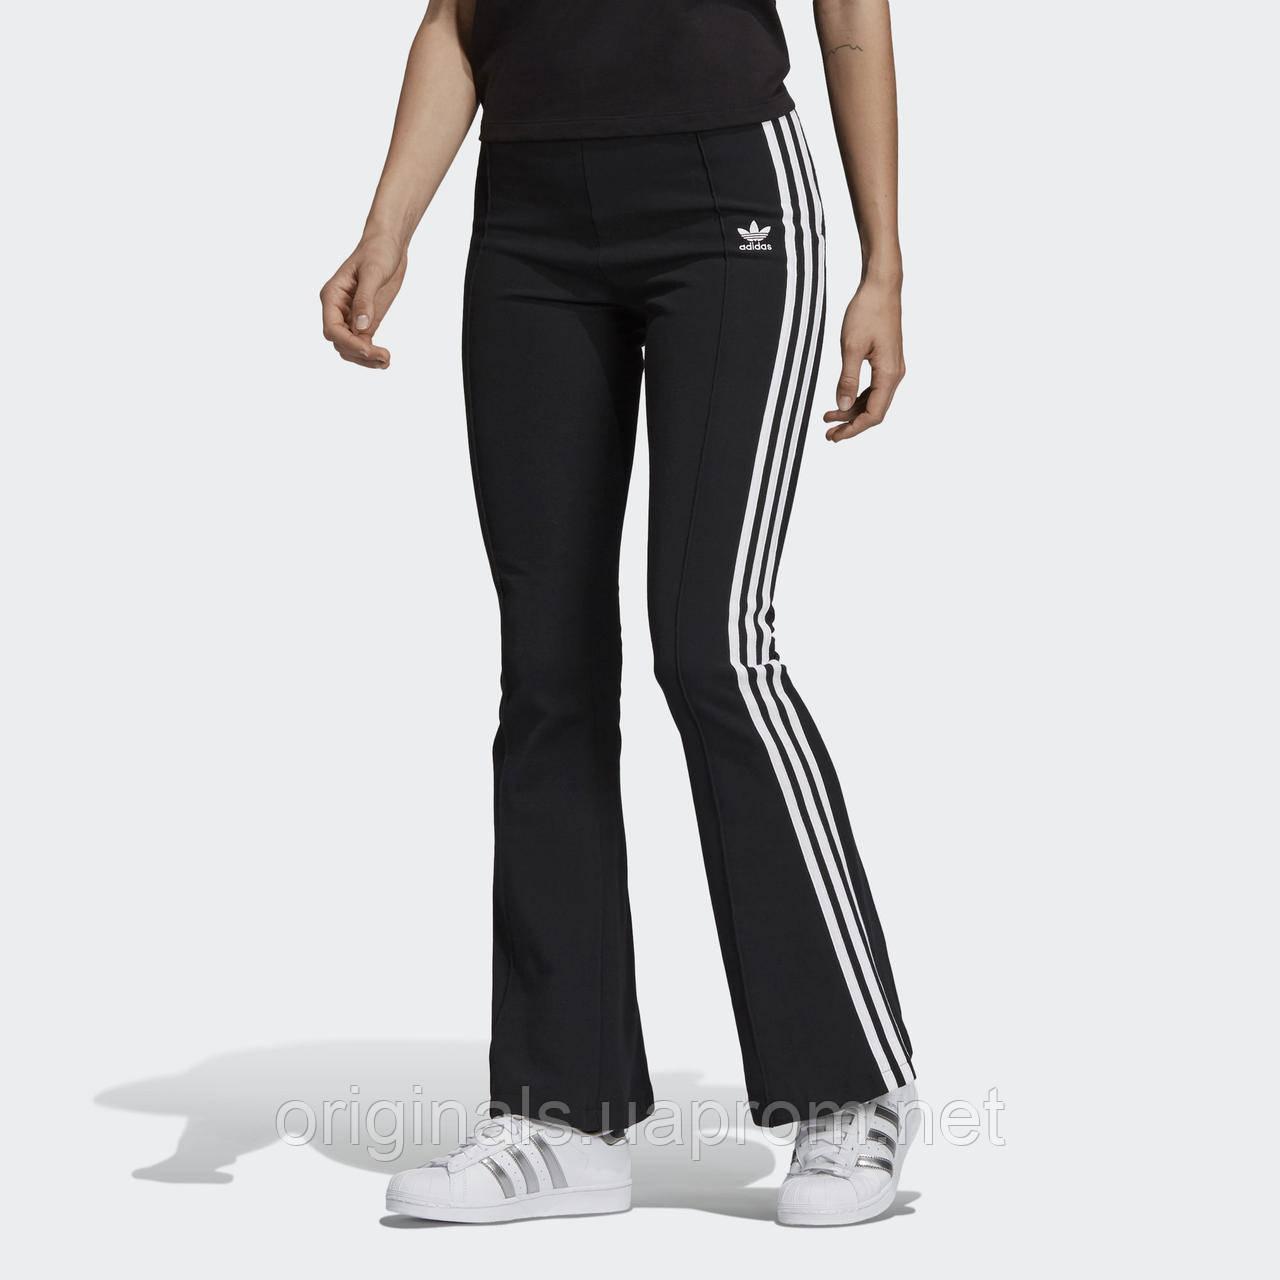 Повседневные штаны Adidas Flared W DV2602